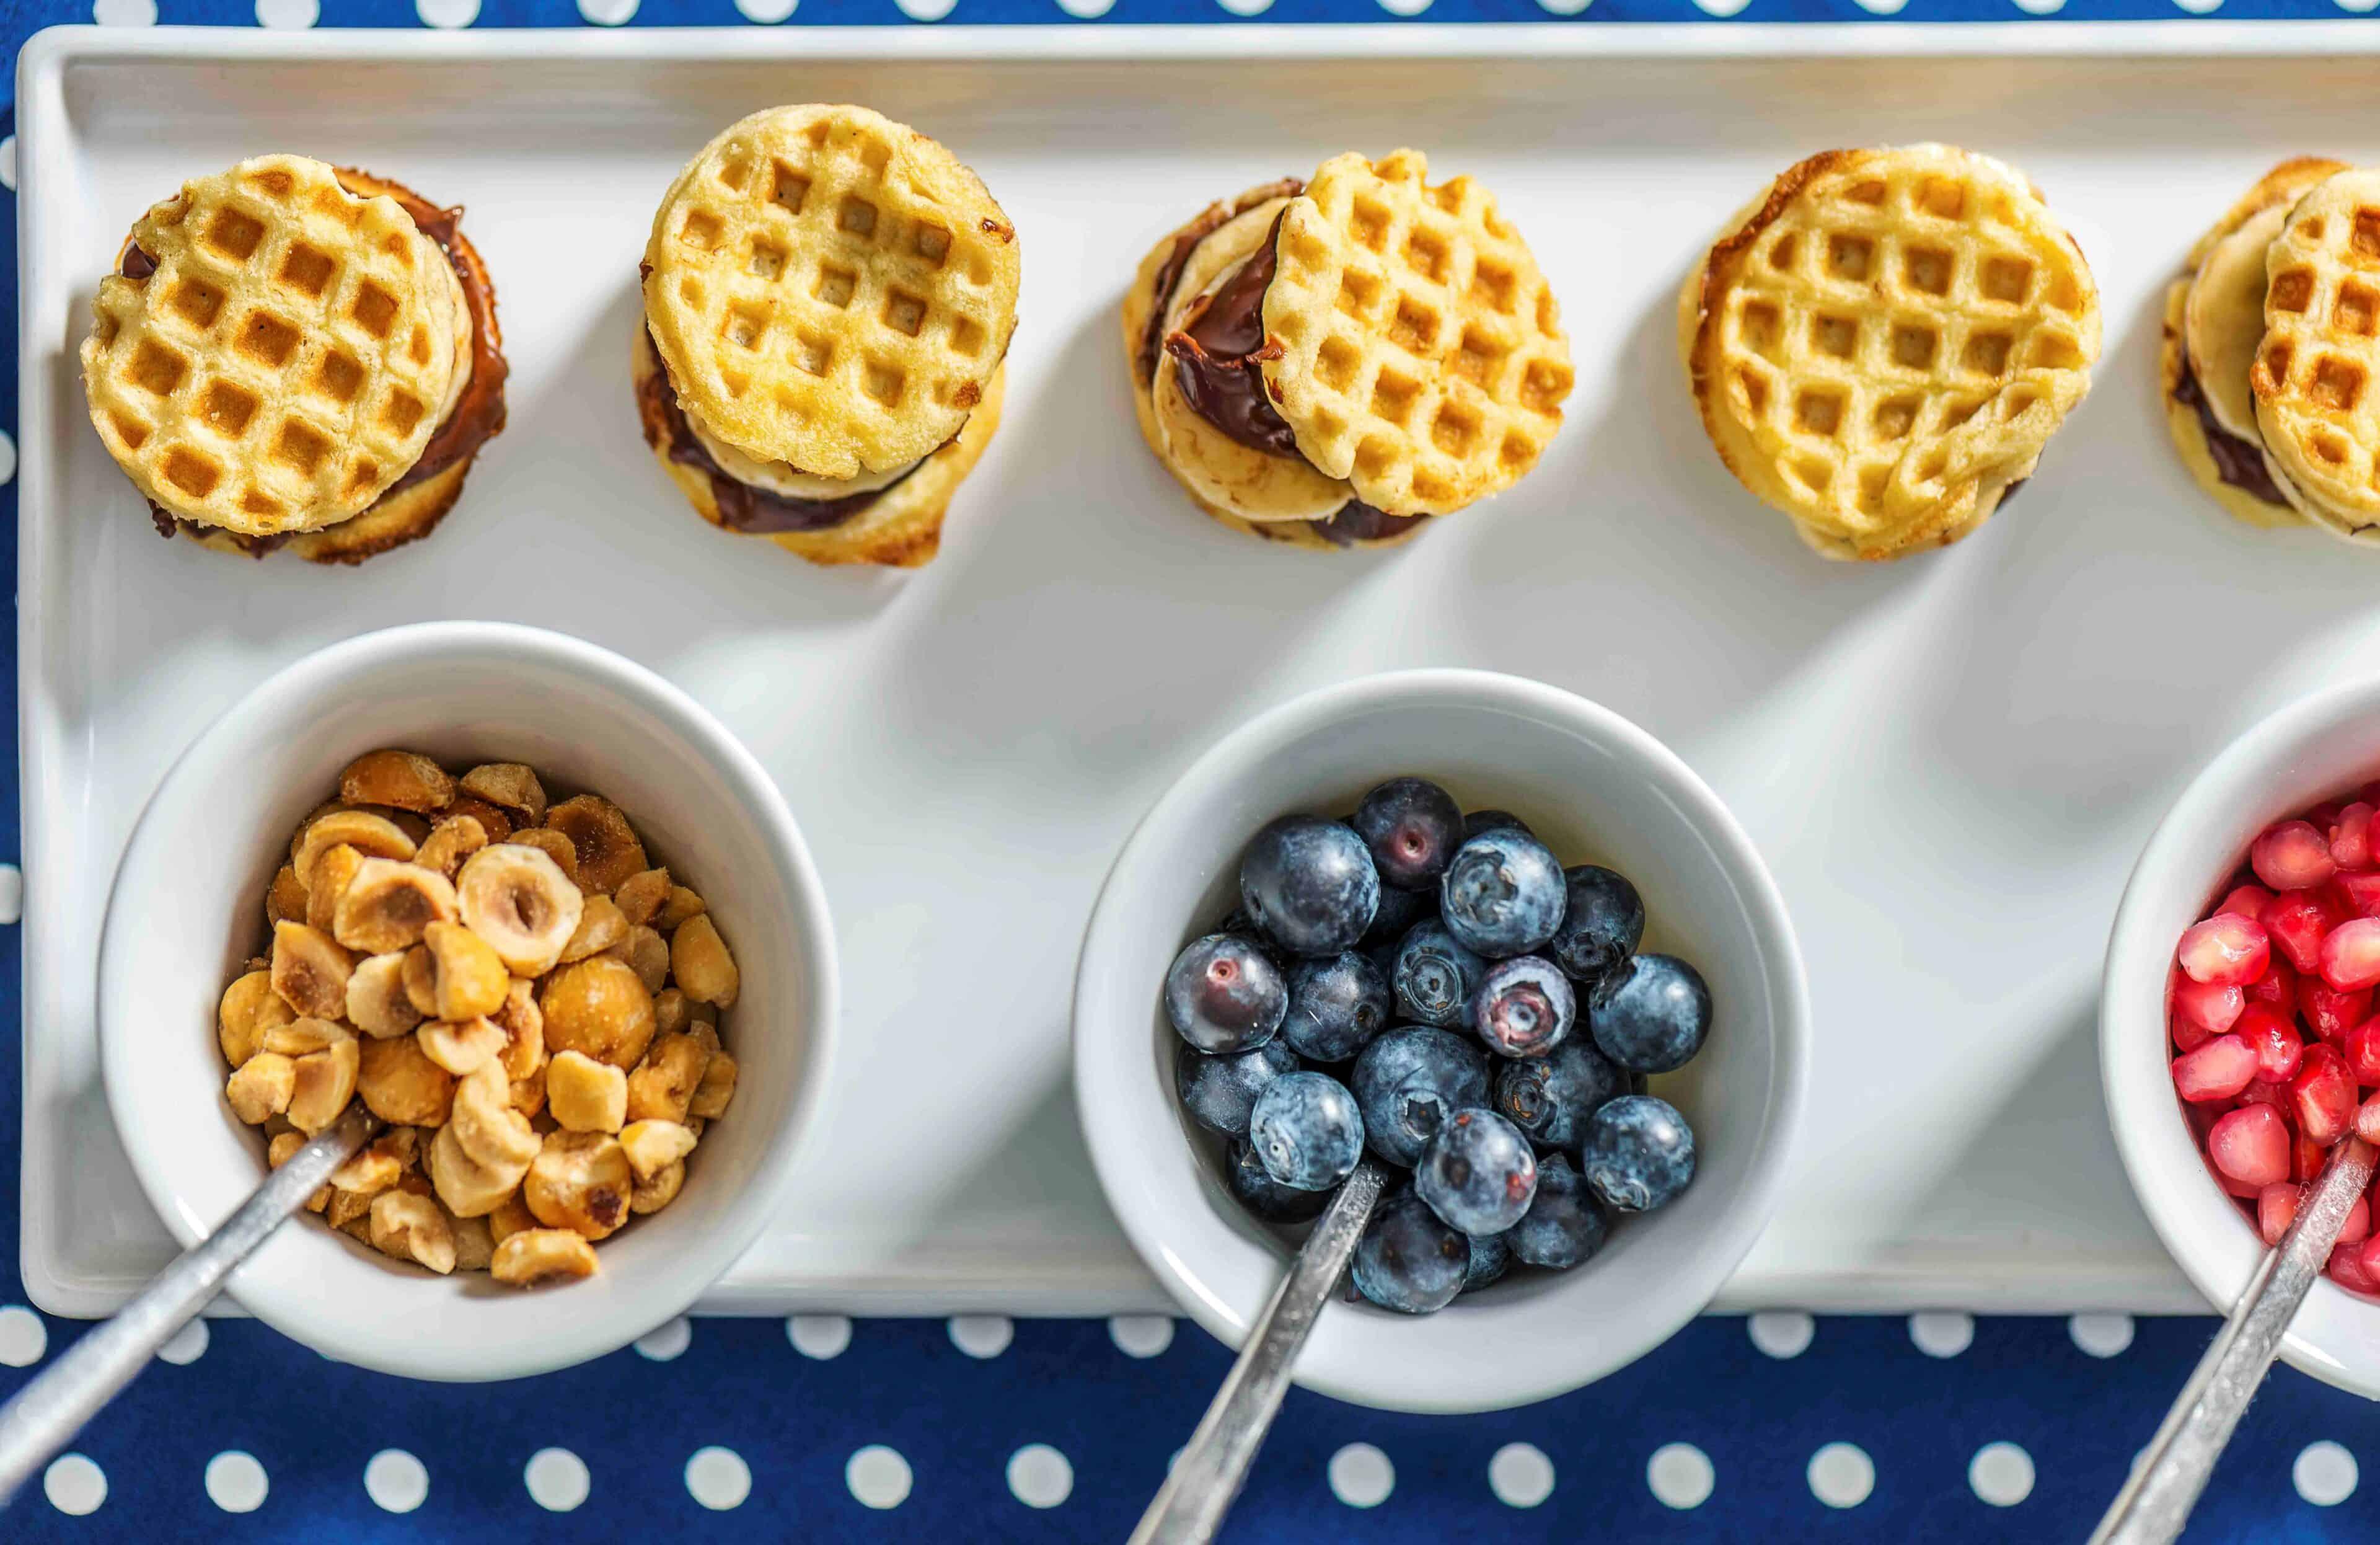 Mini Waffle Sandwiches, Fruit and Nutella